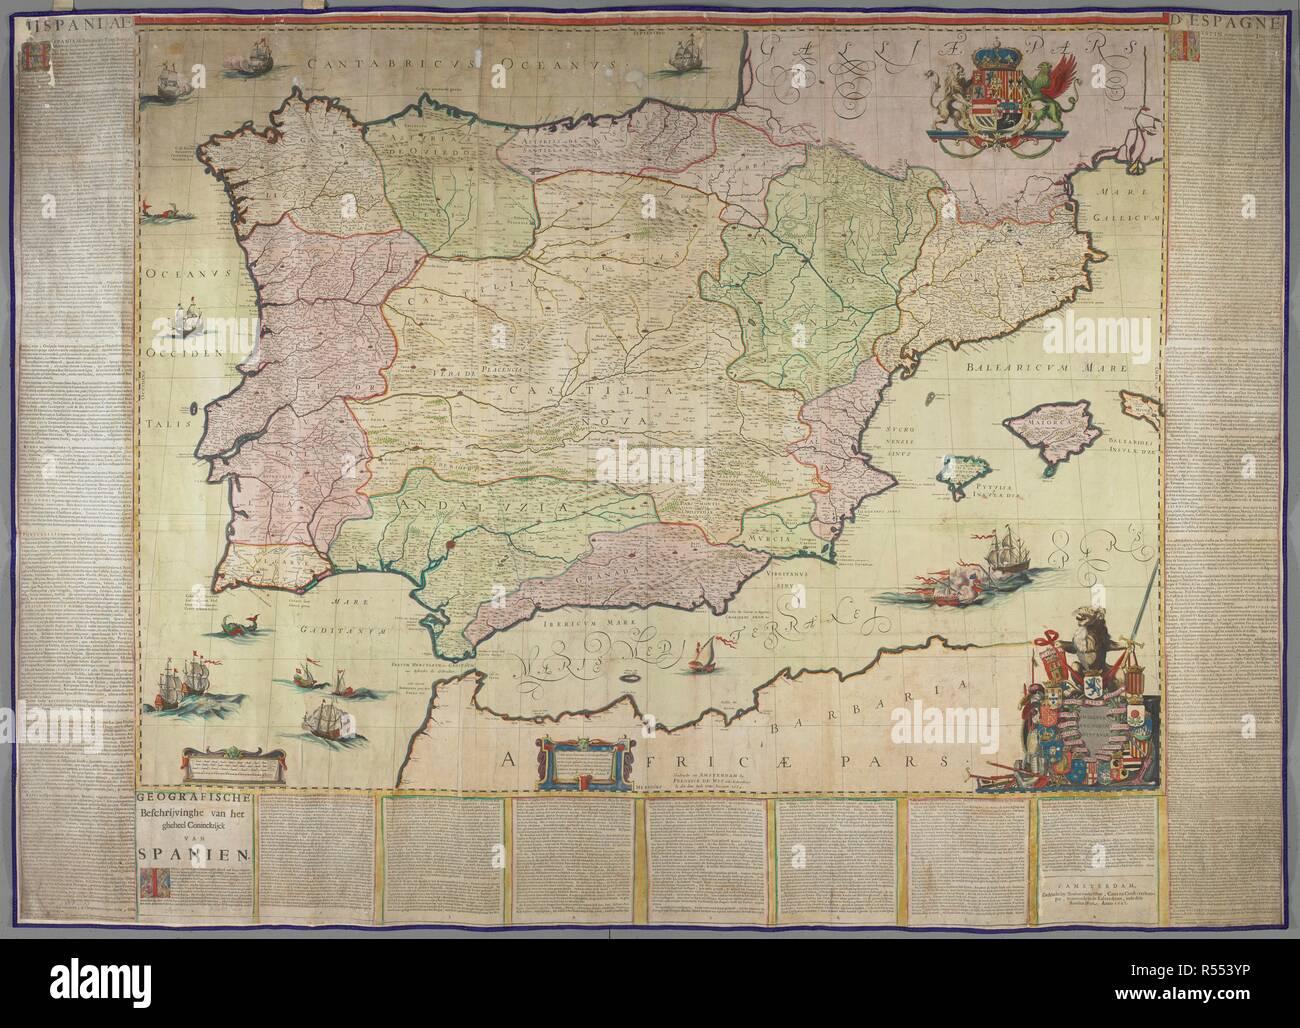 Map Of Spain 711.A Map Of Spain Insignia Regnorum Hispania Amsterdam Gedruckt Tot